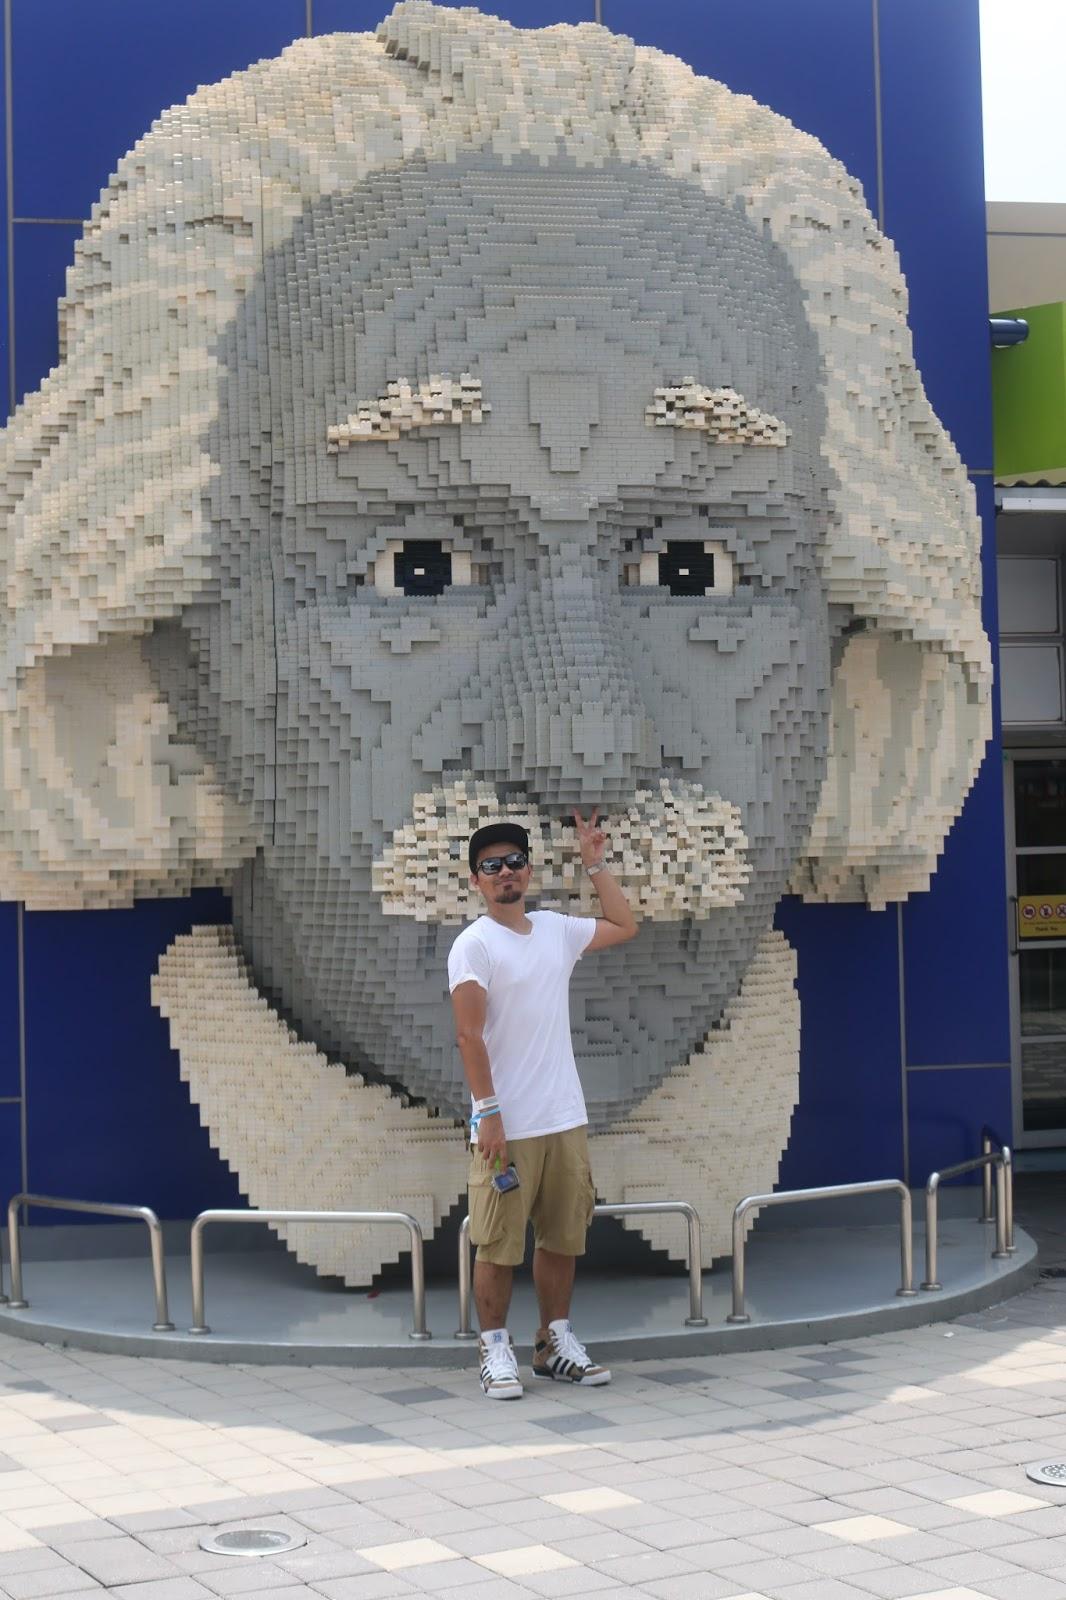 Legoland Malaysia, Johor Bahru | t.O.t.O.i. - My Blog. My ...